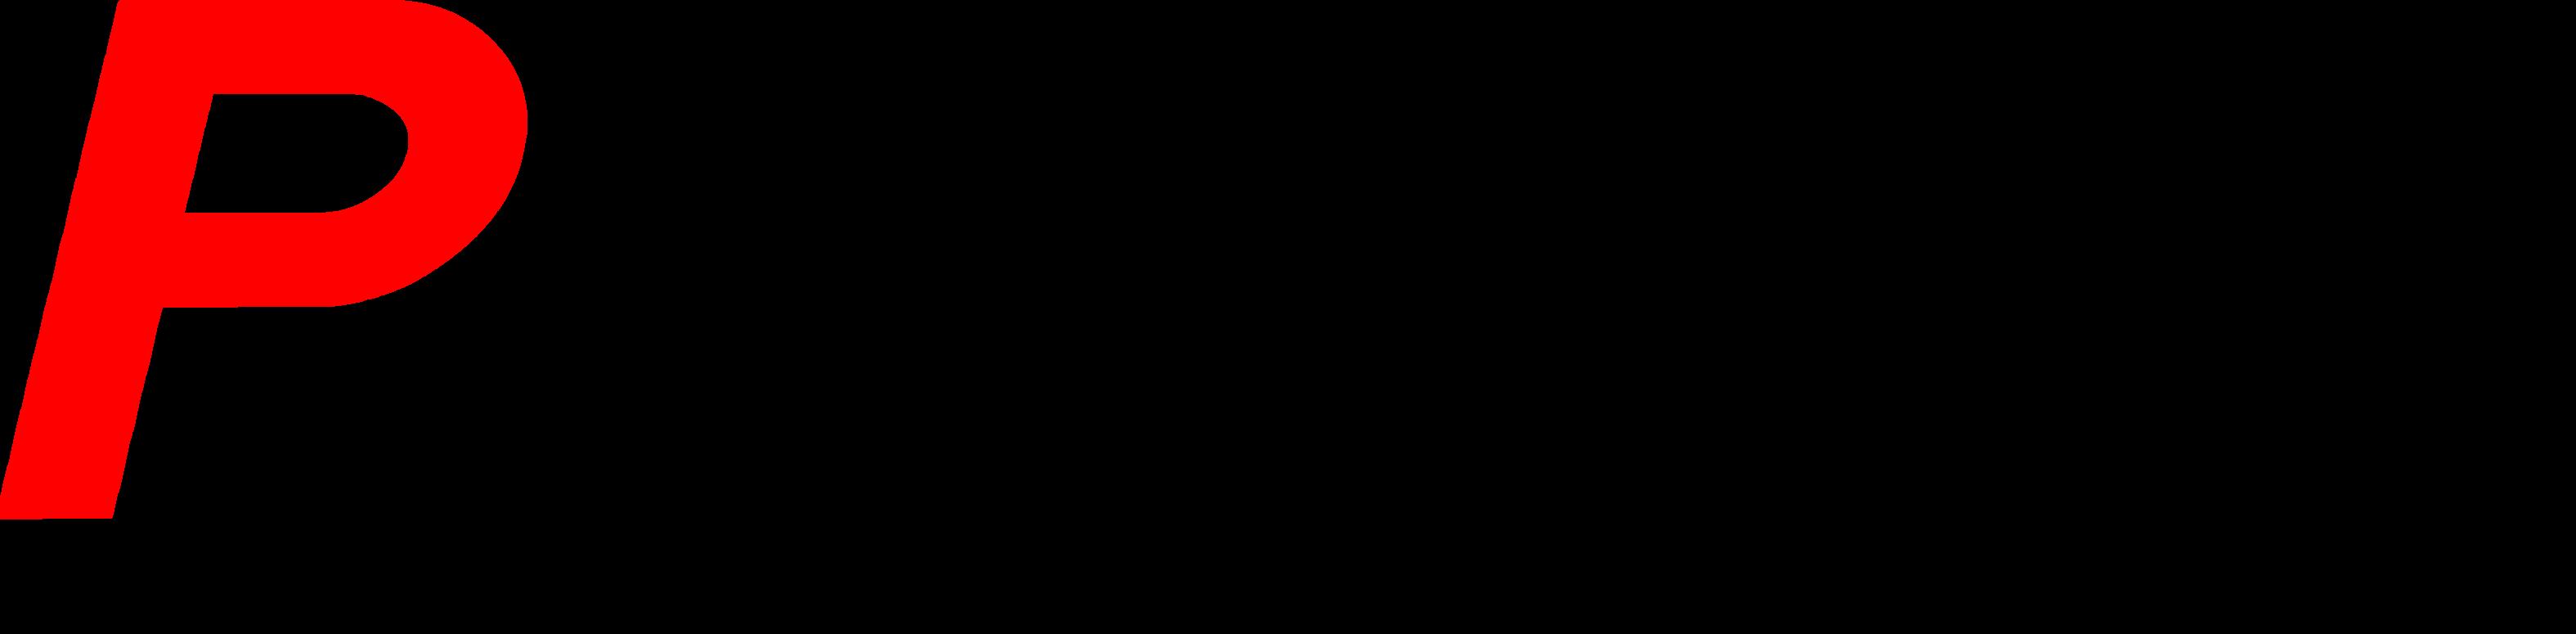 Plusivo_logo_fancy-cropped_3621a90394.png